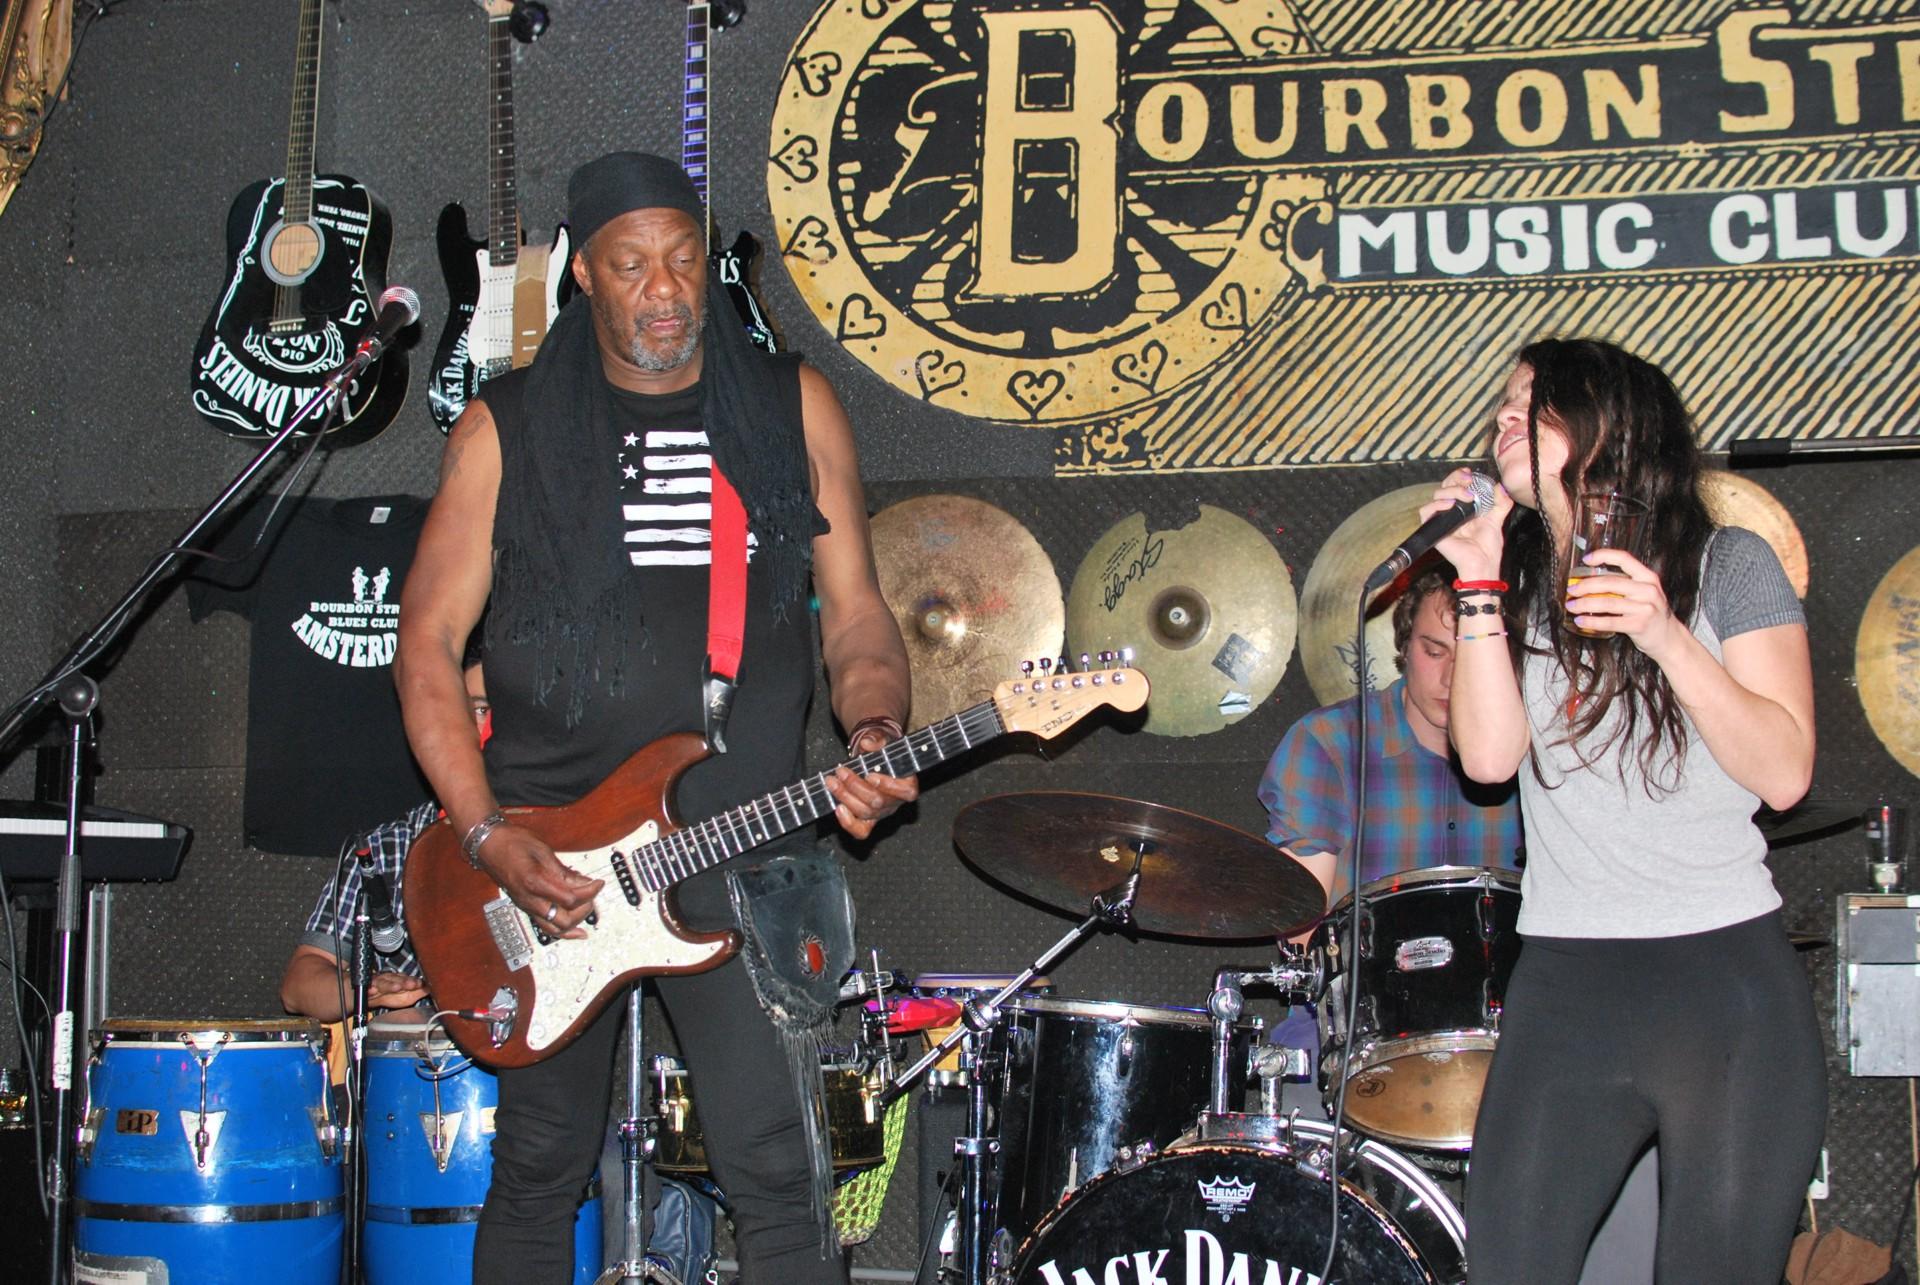 Jamming in Bourbon Street